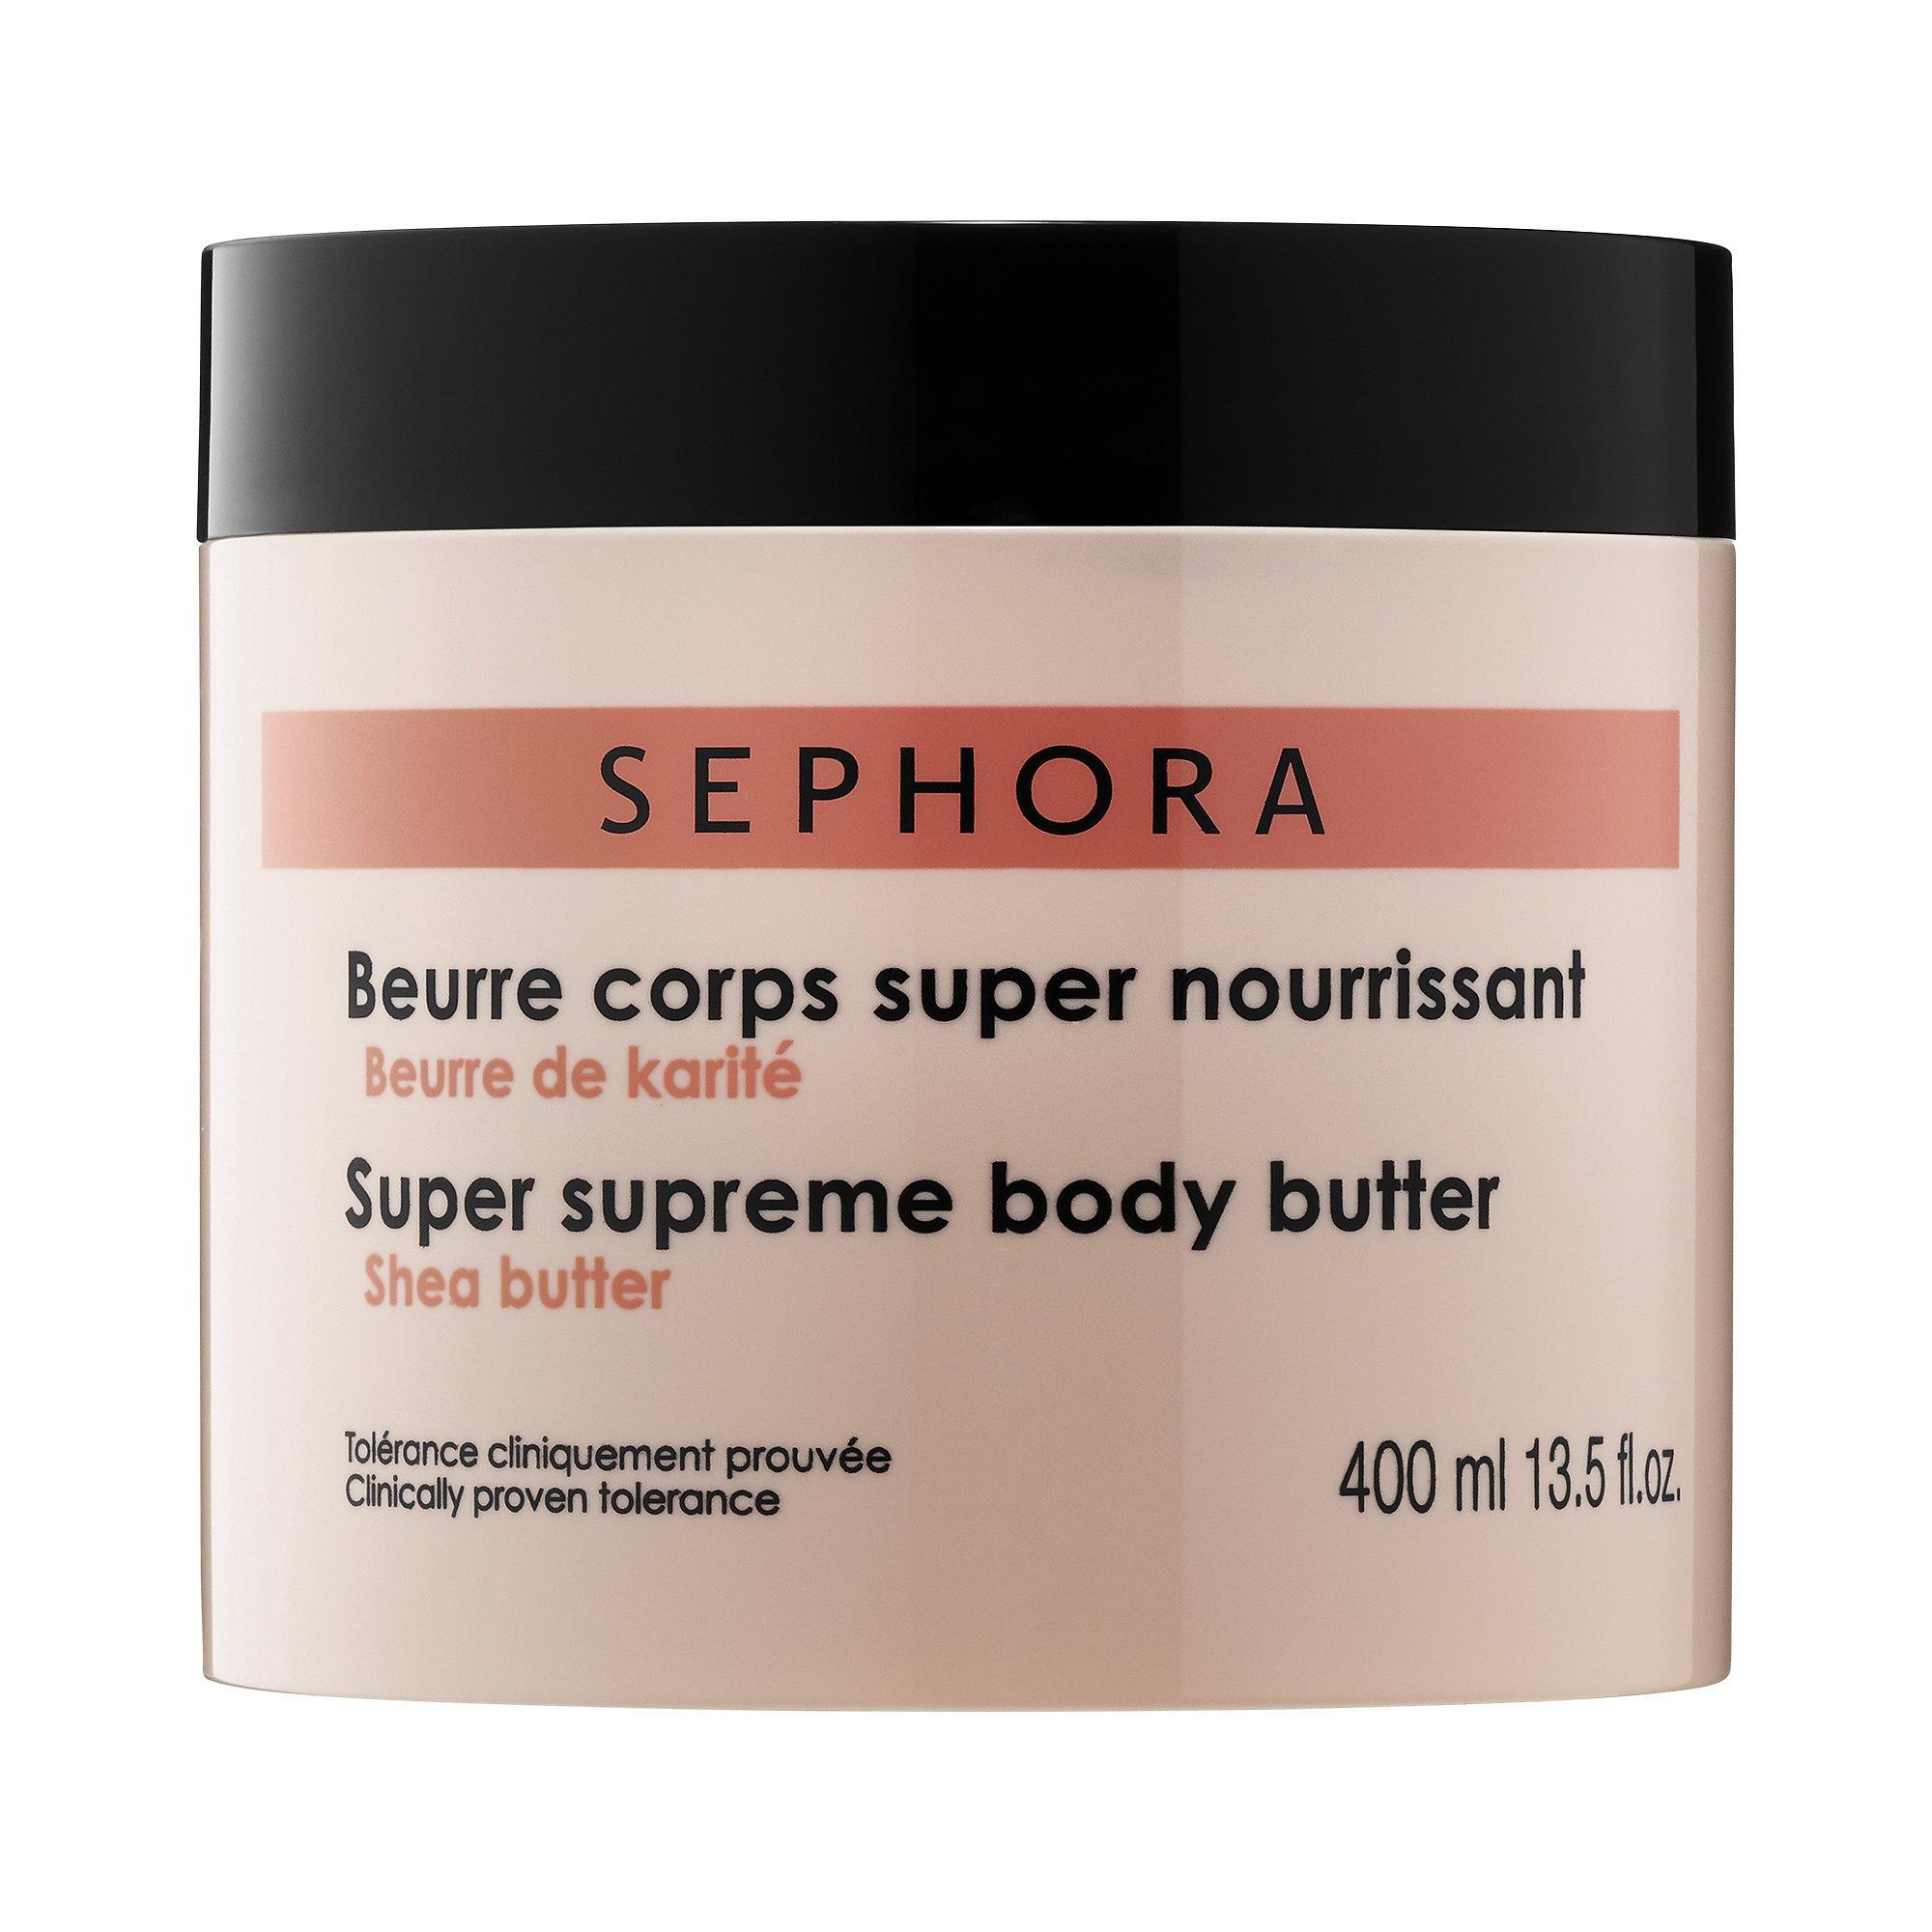 SEPHORA COLLECTION Super Supreme Body Butter SIZE 13.5 oz/400mL